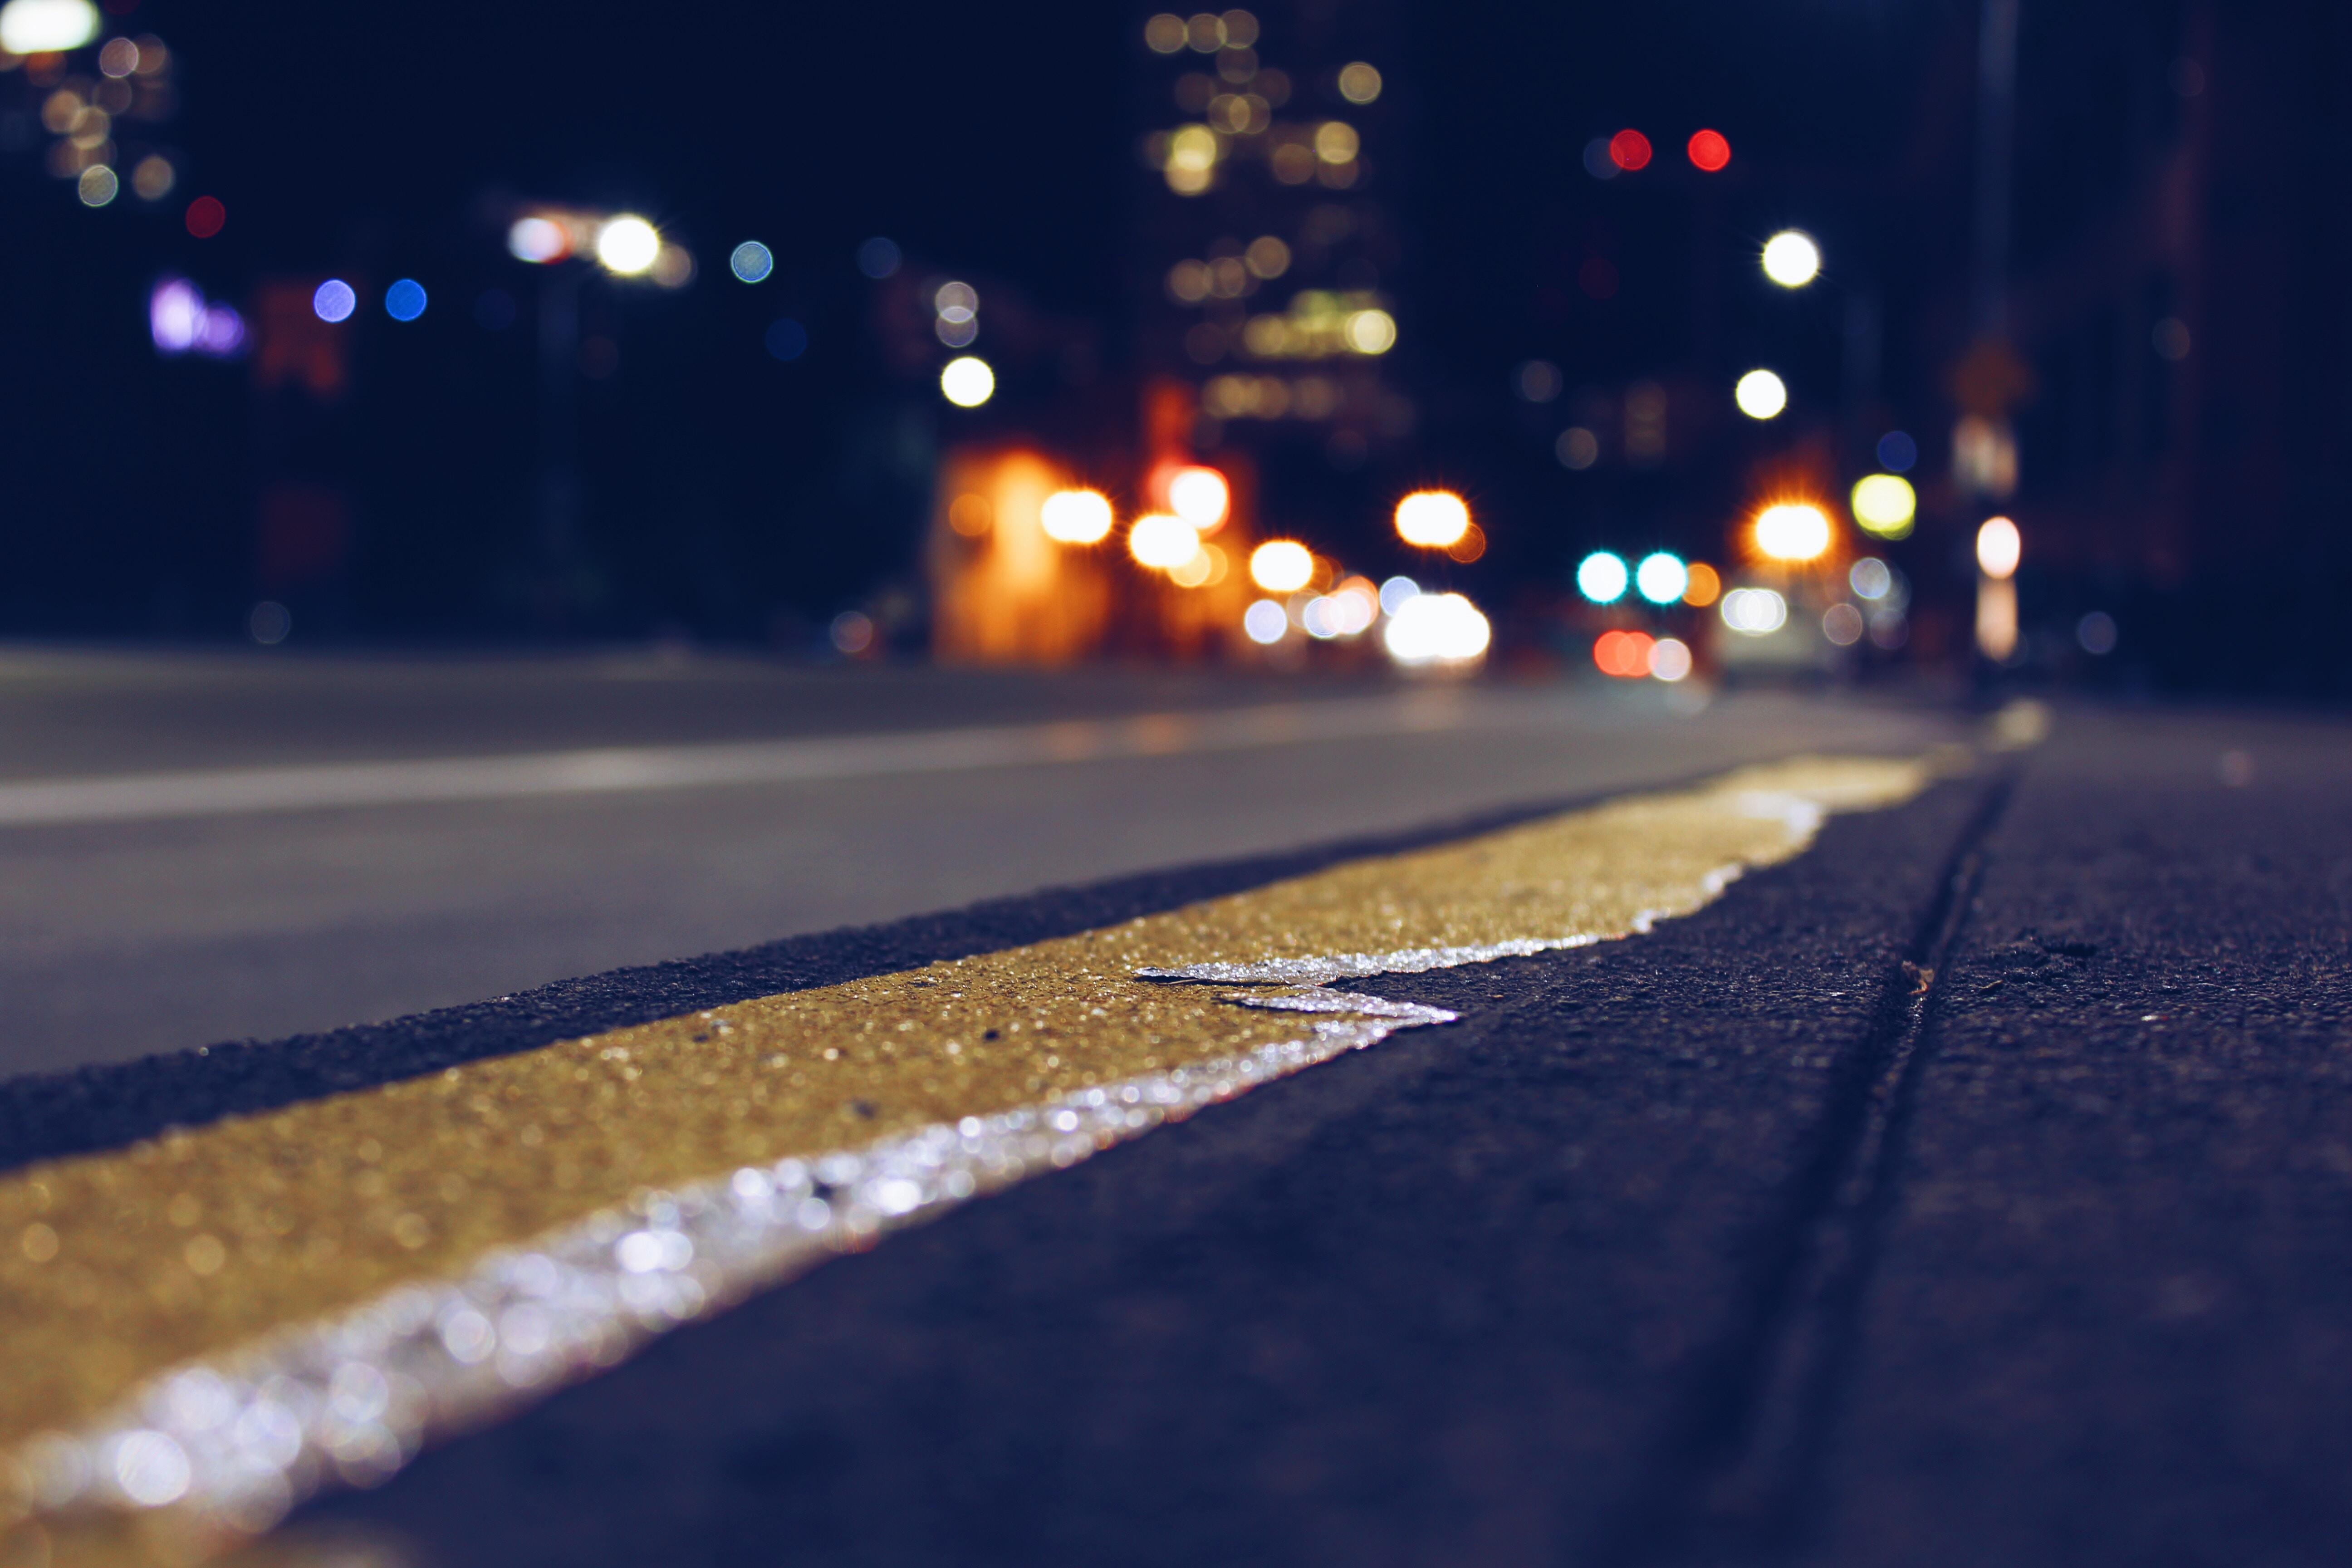 Closeup of a busy urban street at night